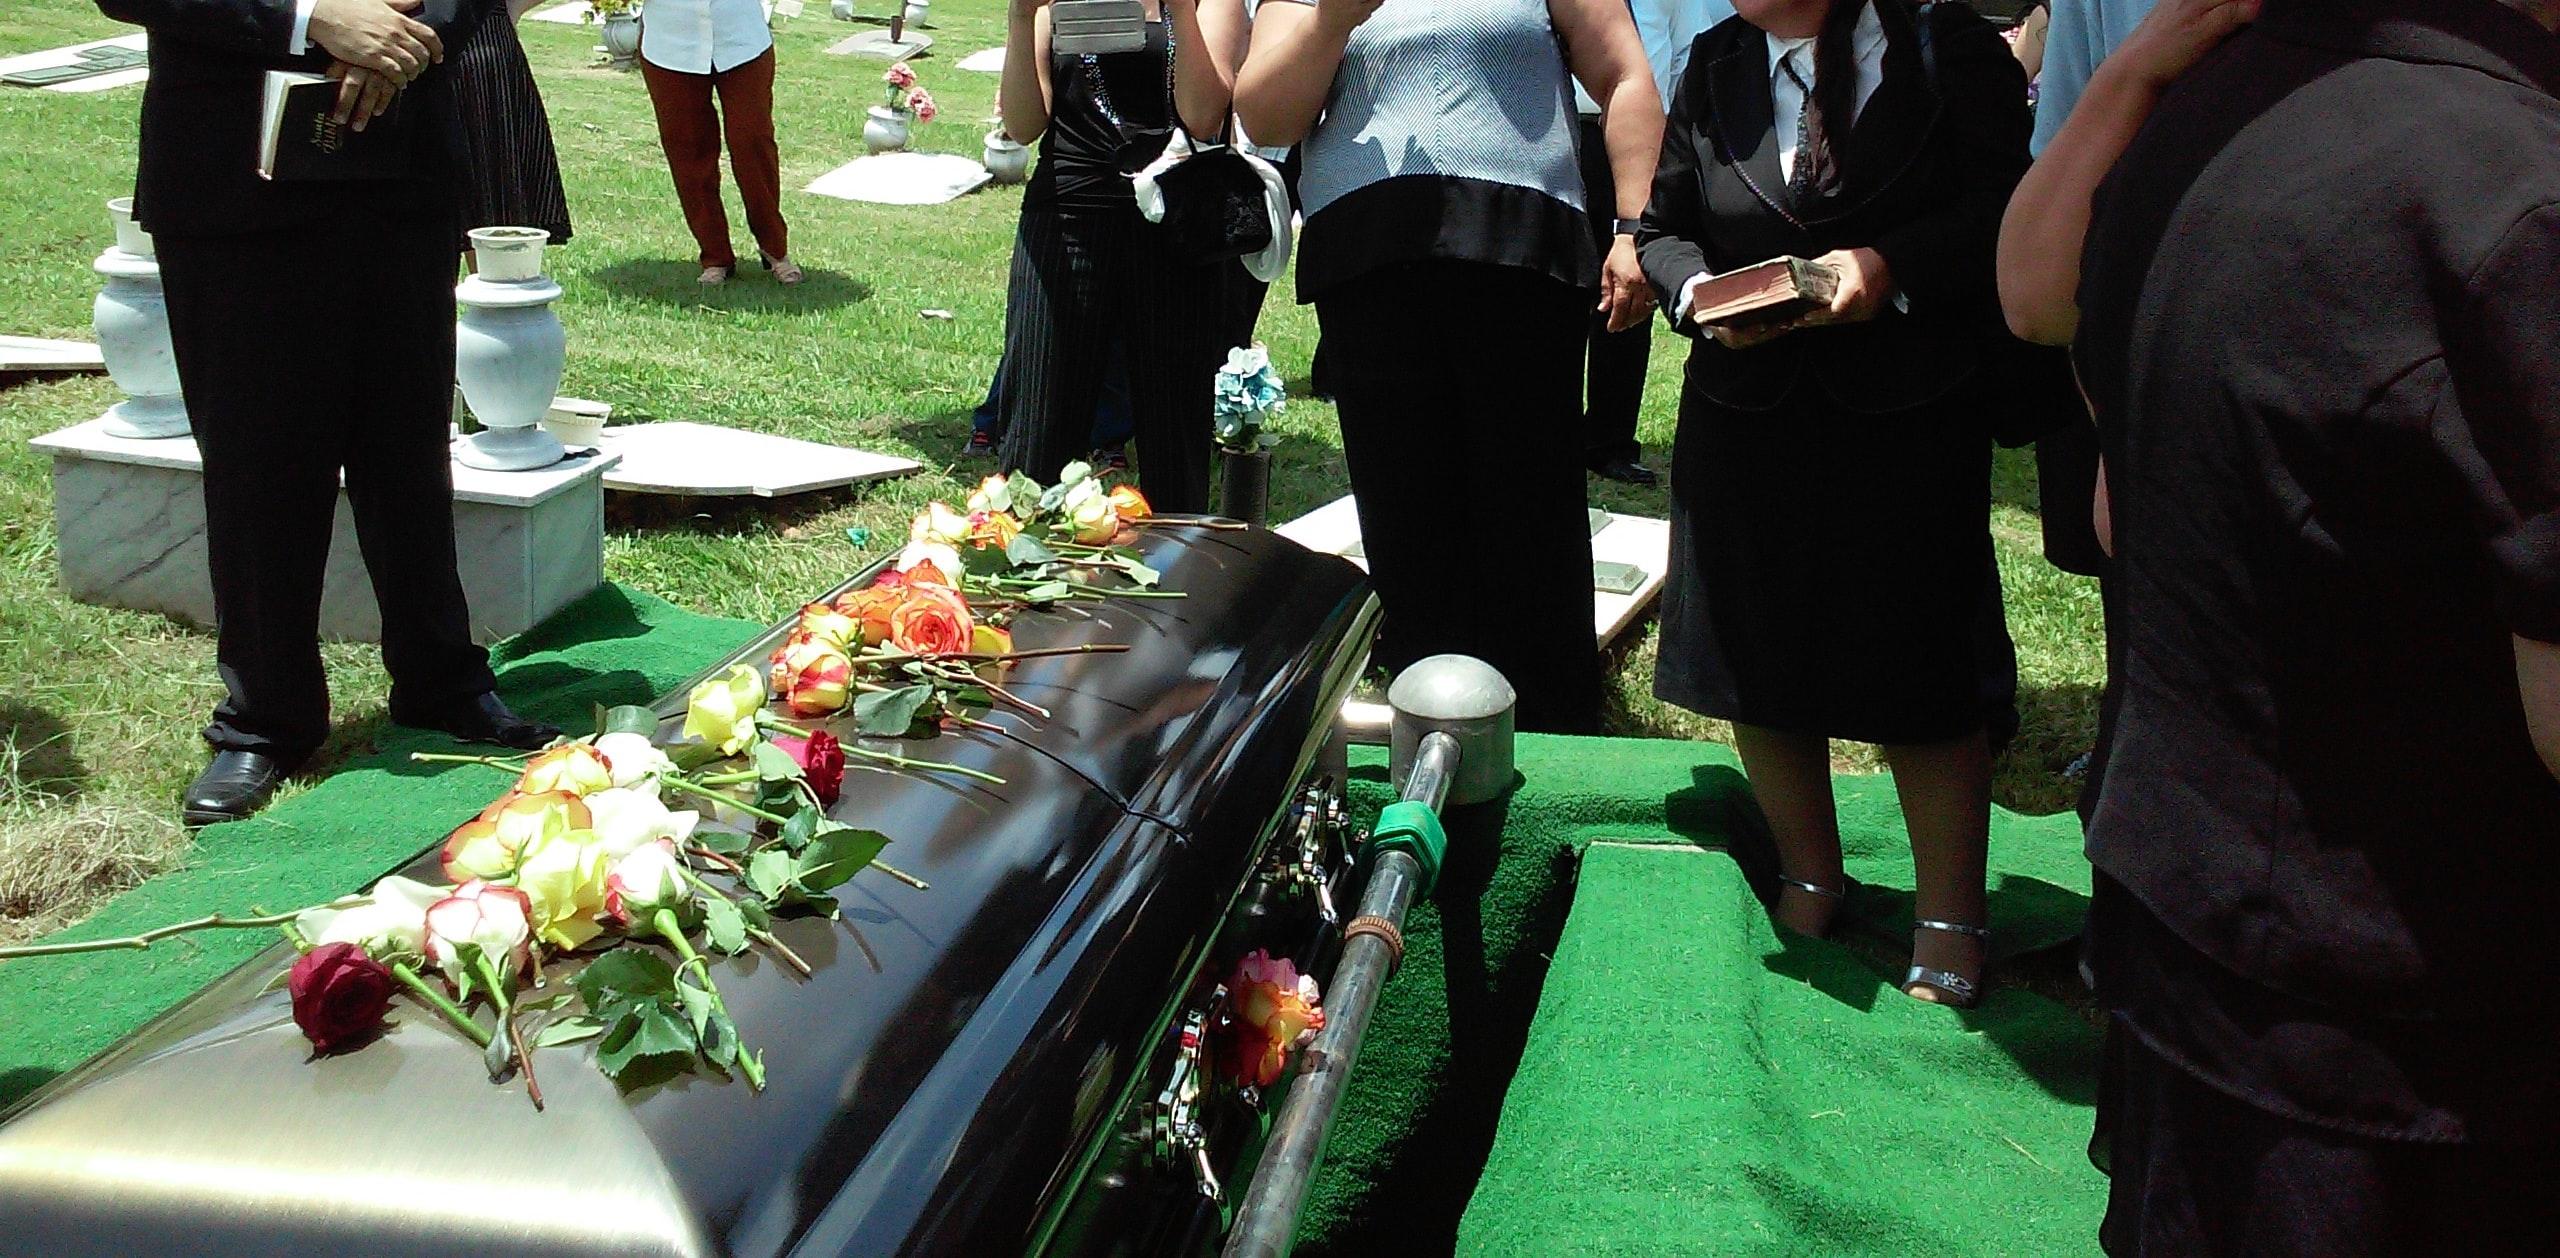 People gathered graveside for burial; image by Rhodi Lopez, via Unsplash.com.